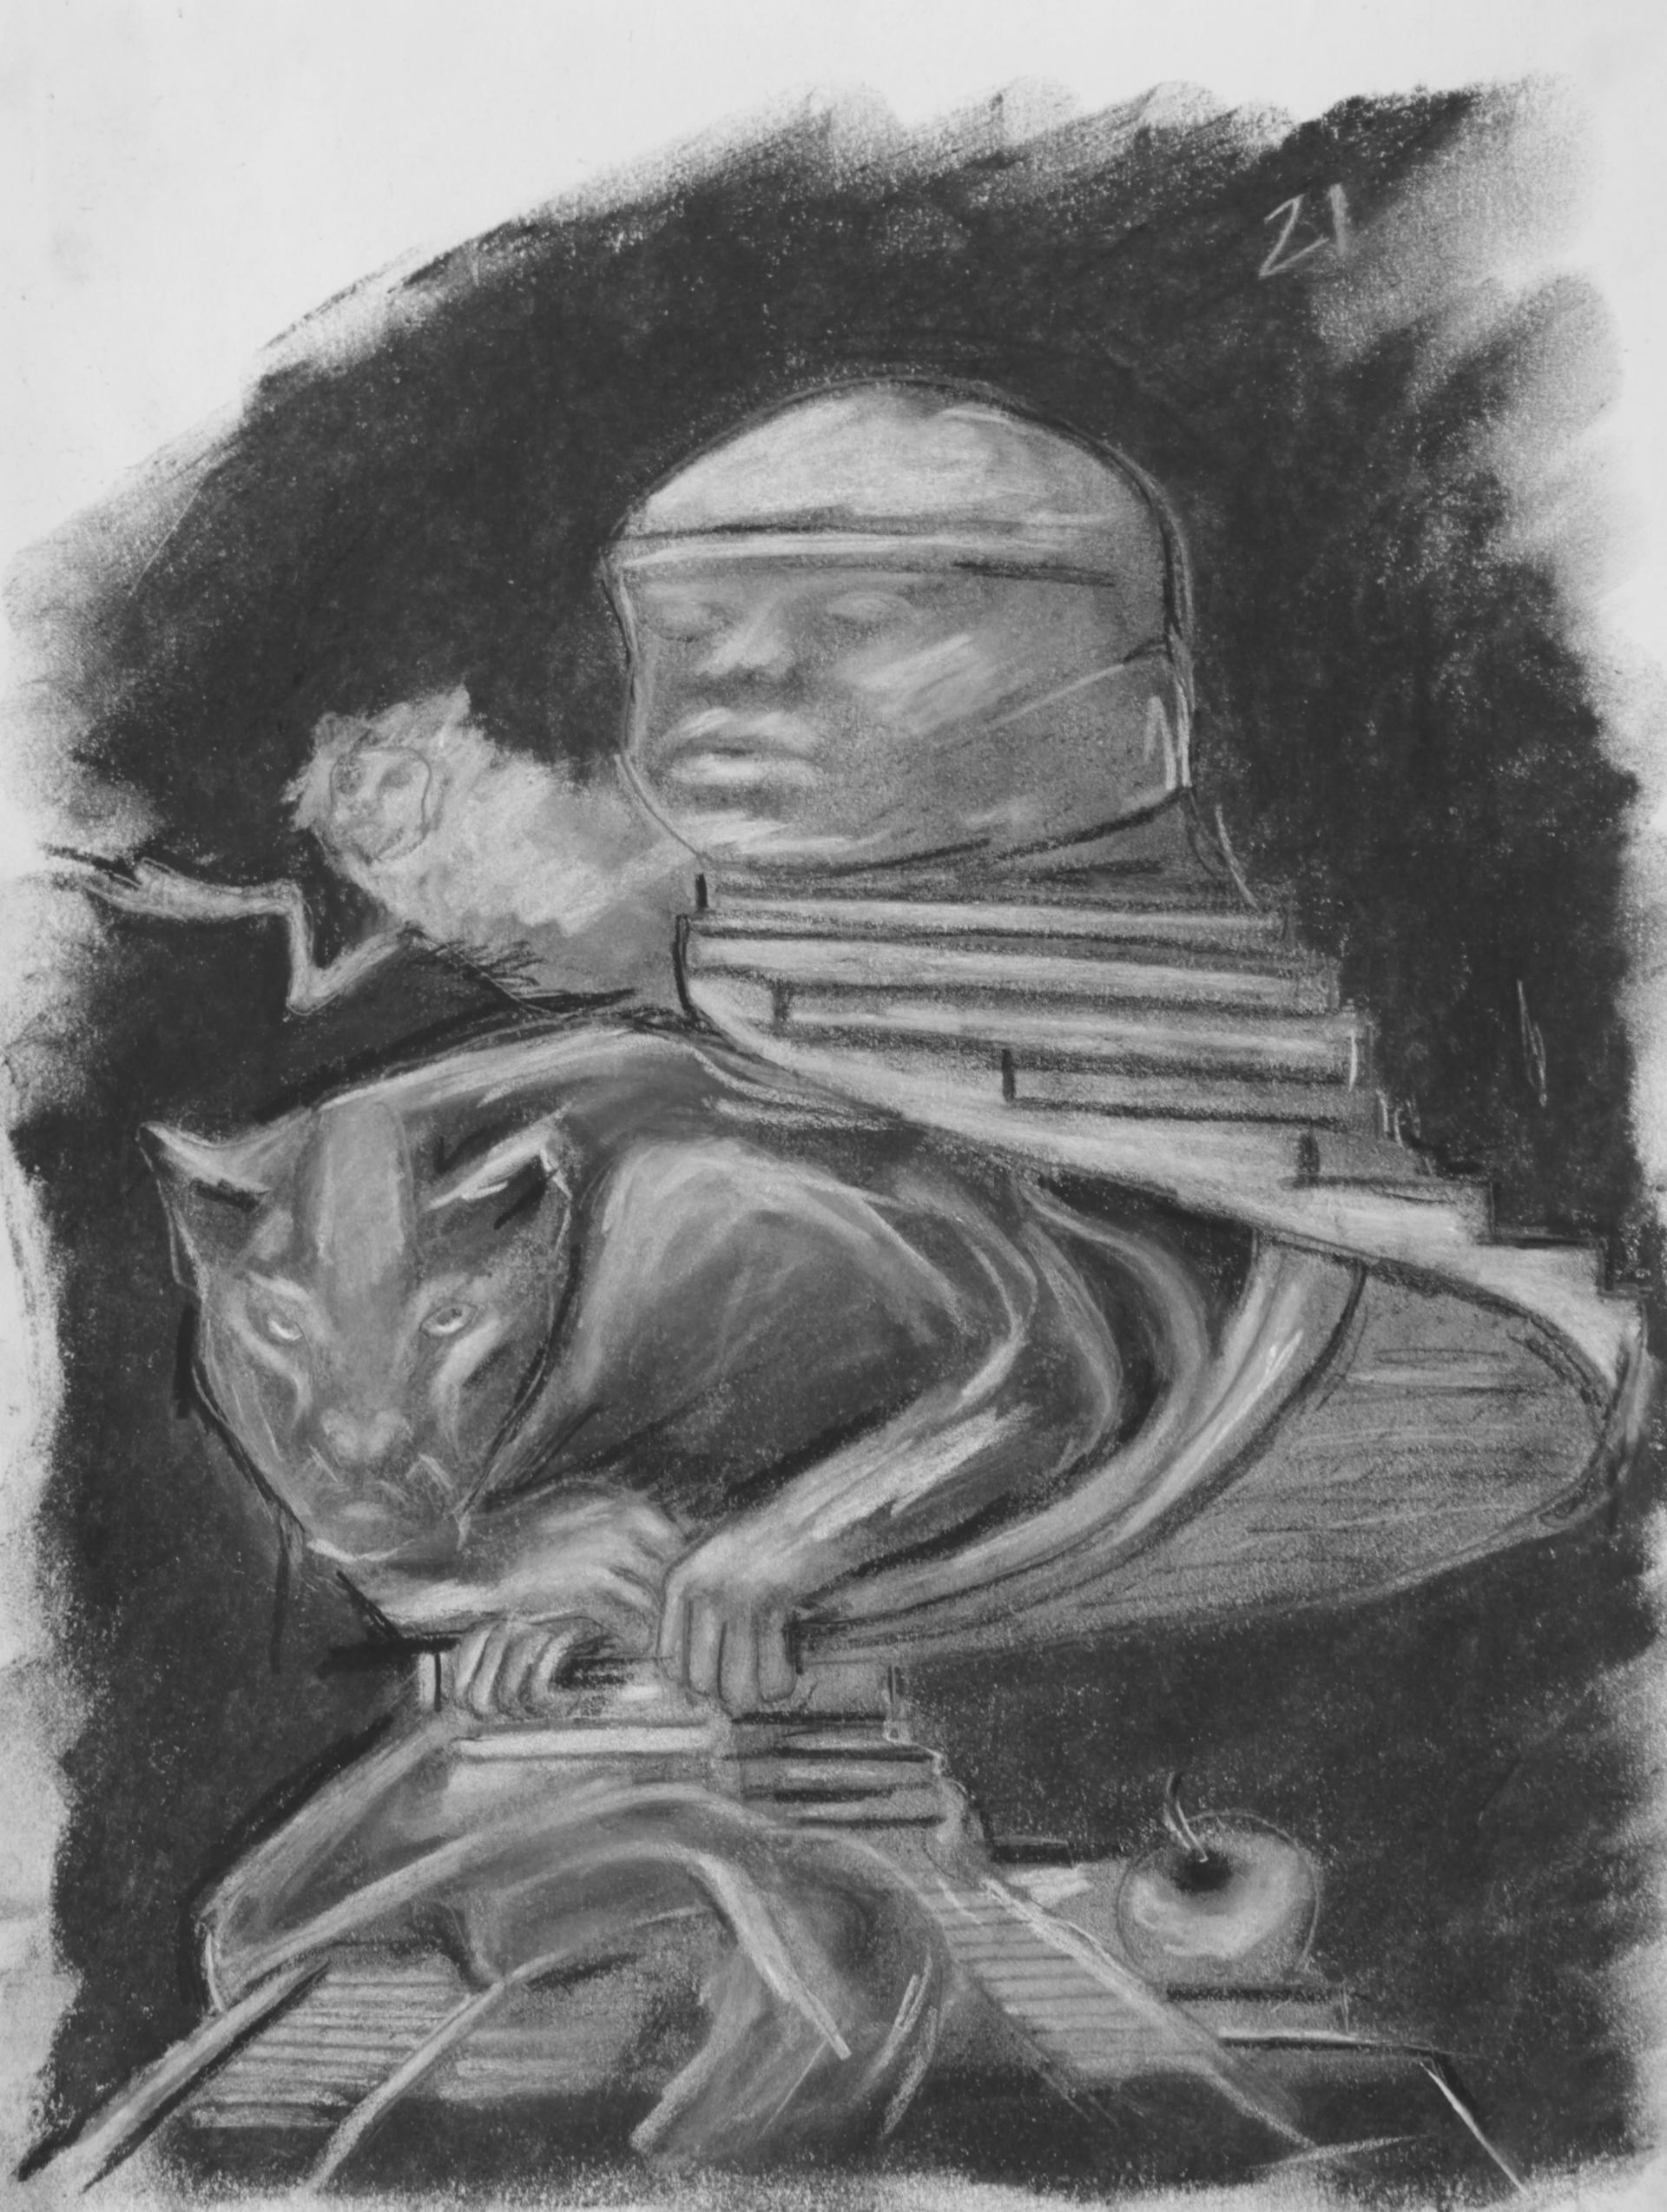 Study 26 by Shay Davis